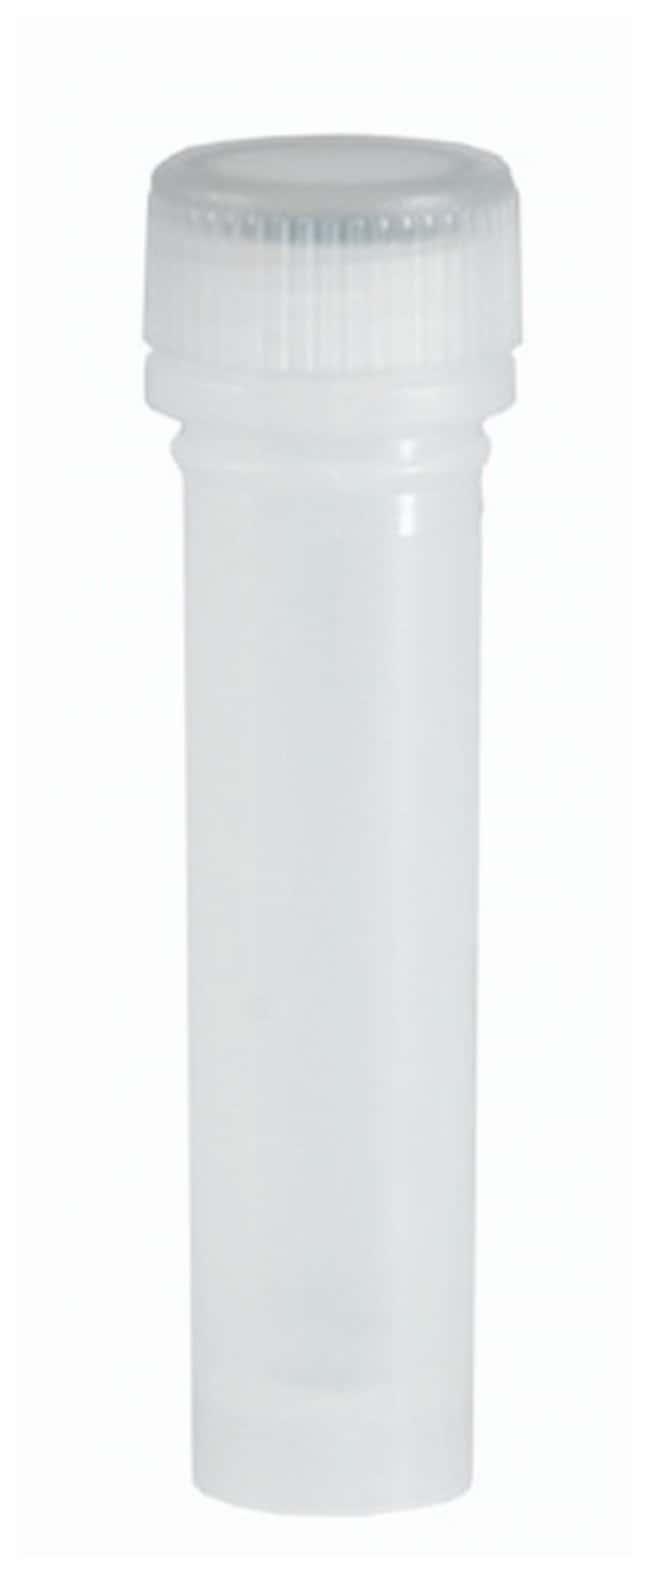 Fisherbrand Bulk tubes :Sonicators, Homogenizers and Blenders:Homogenizers